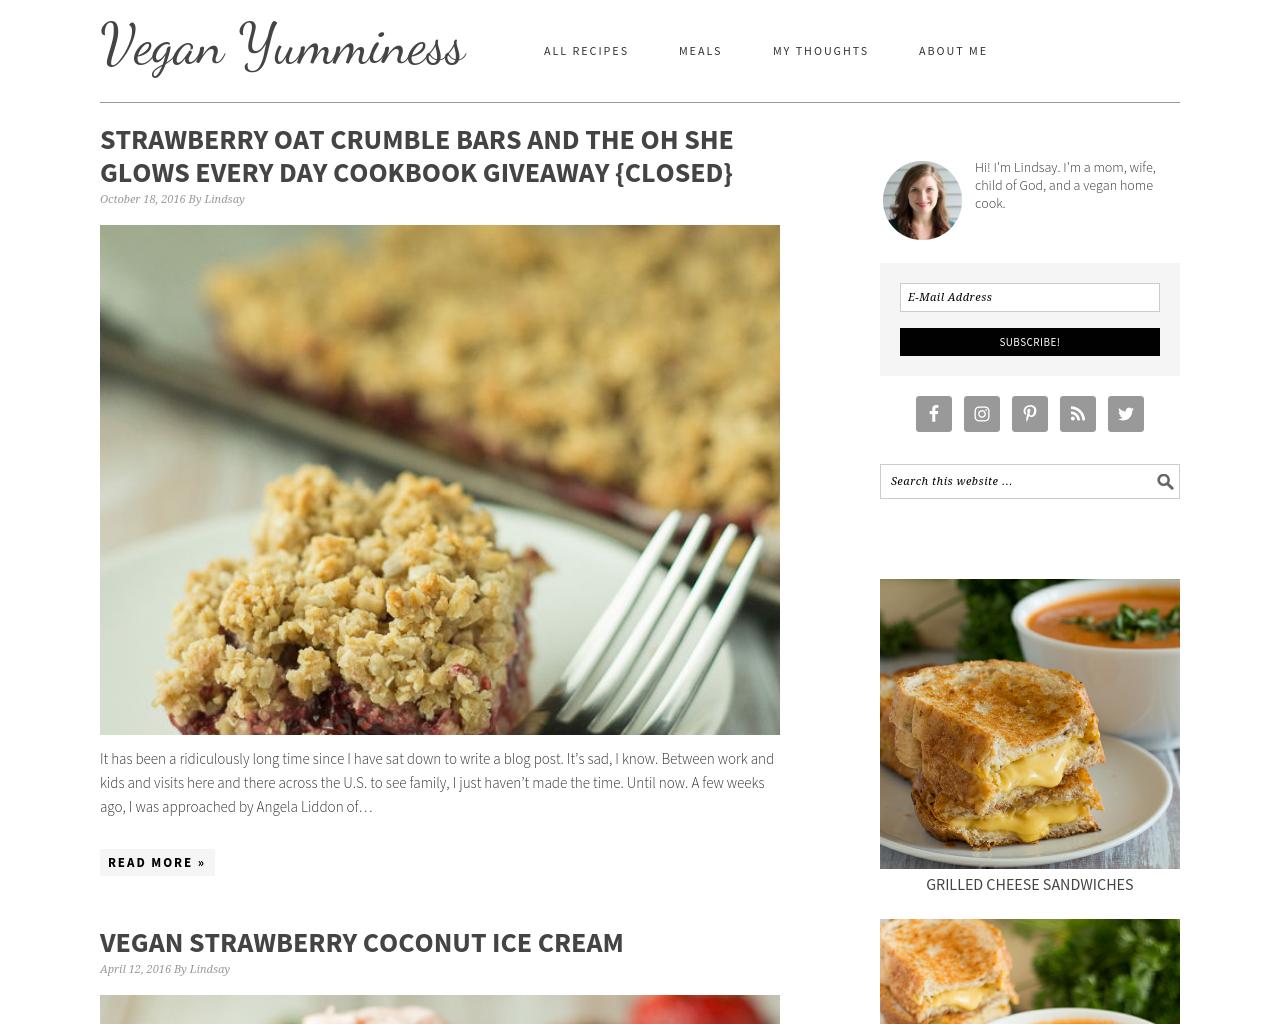 Vegan-Yumminess-Advertising-Reviews-Pricing